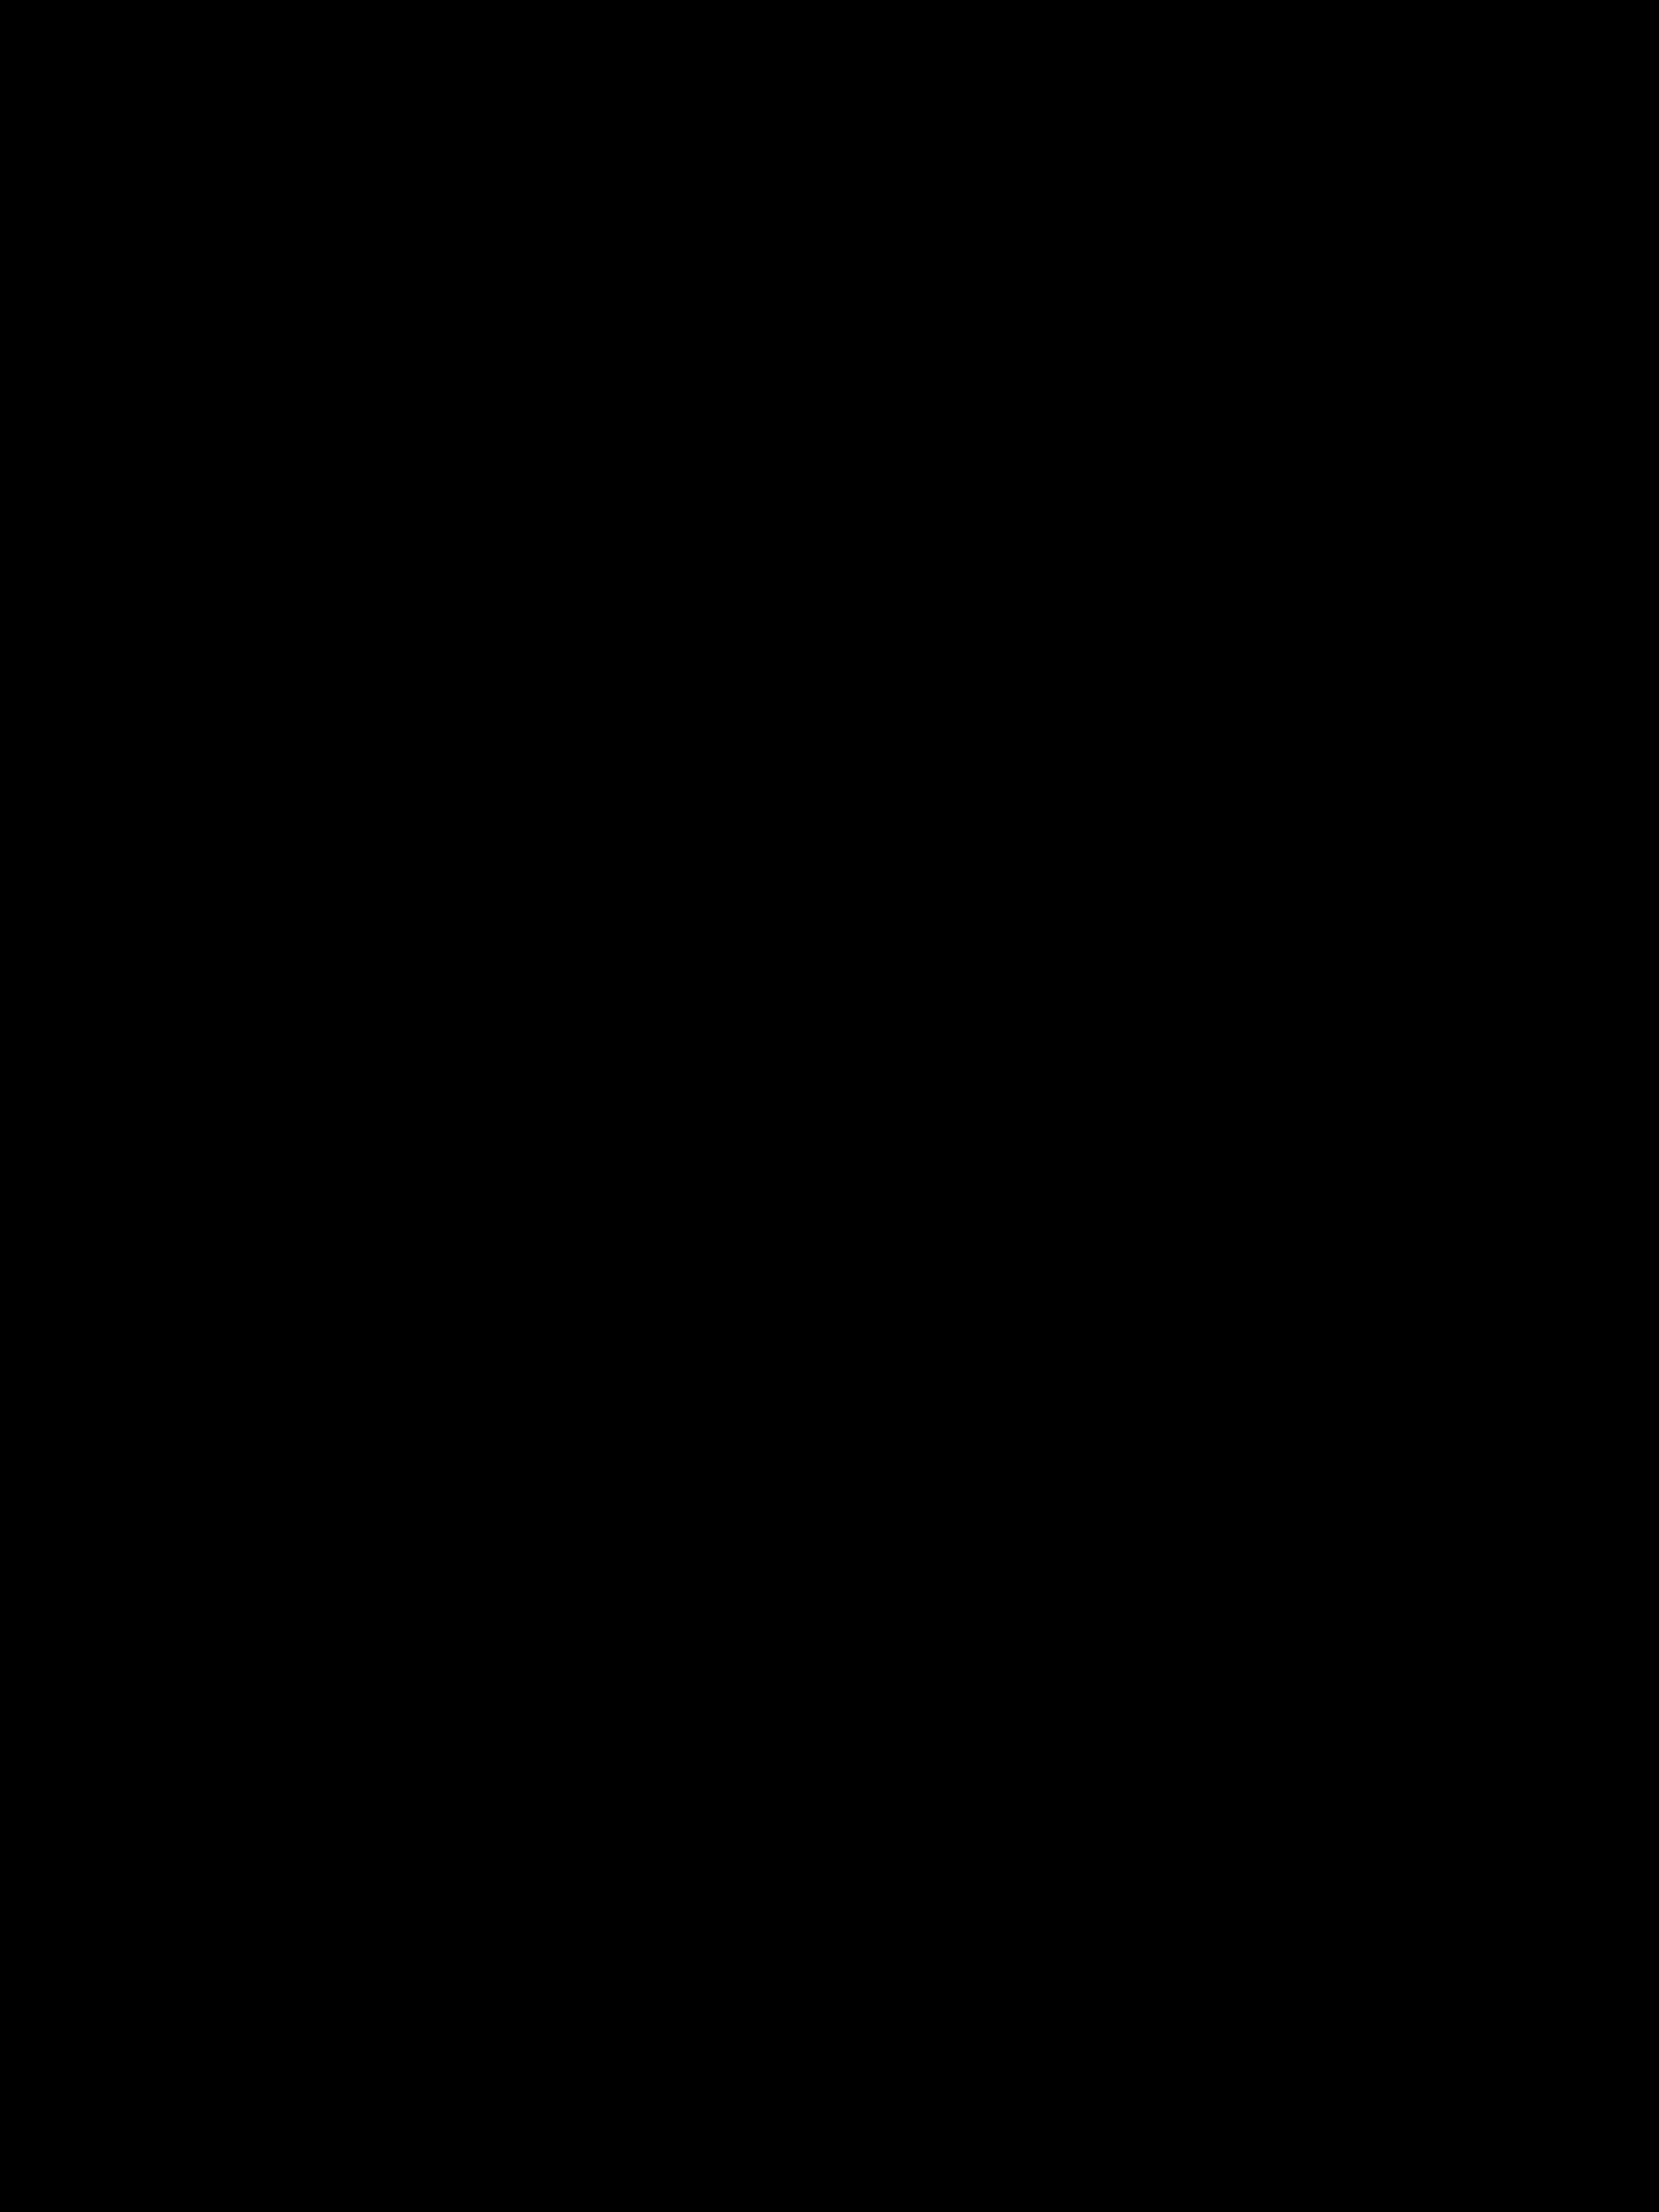 Premier millesime en blanc